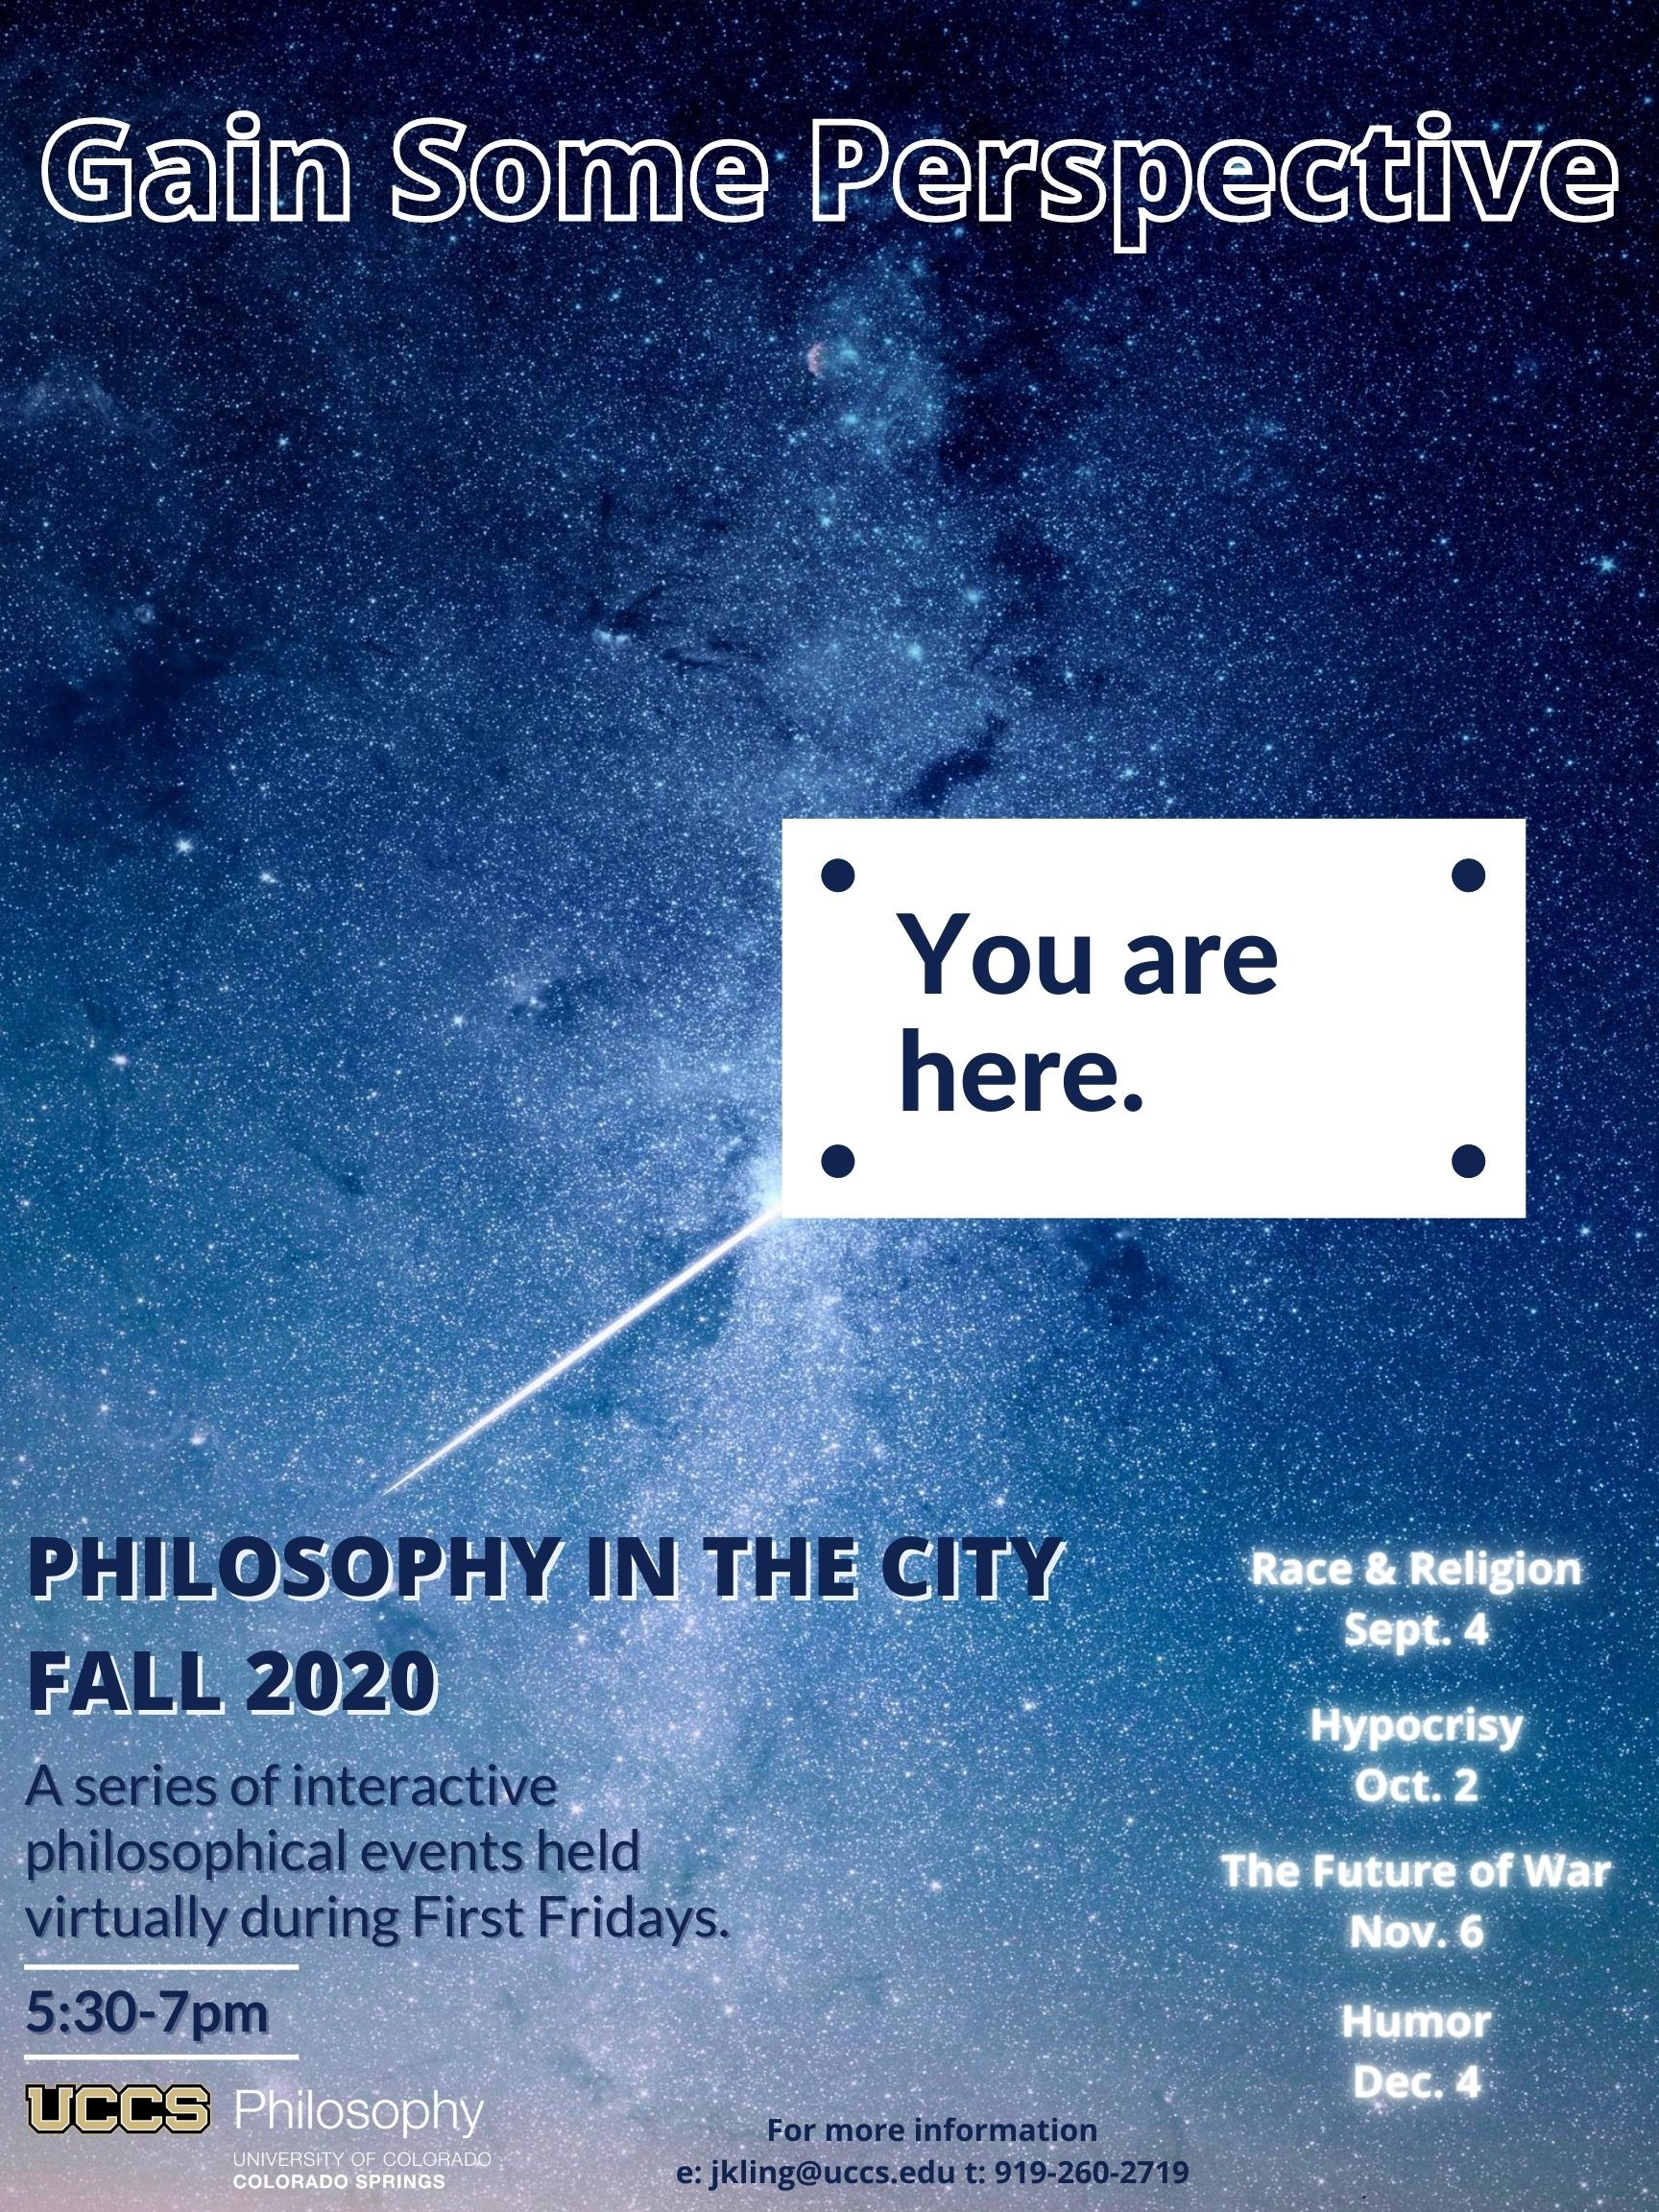 PhilosophyInTheCitySeries2020